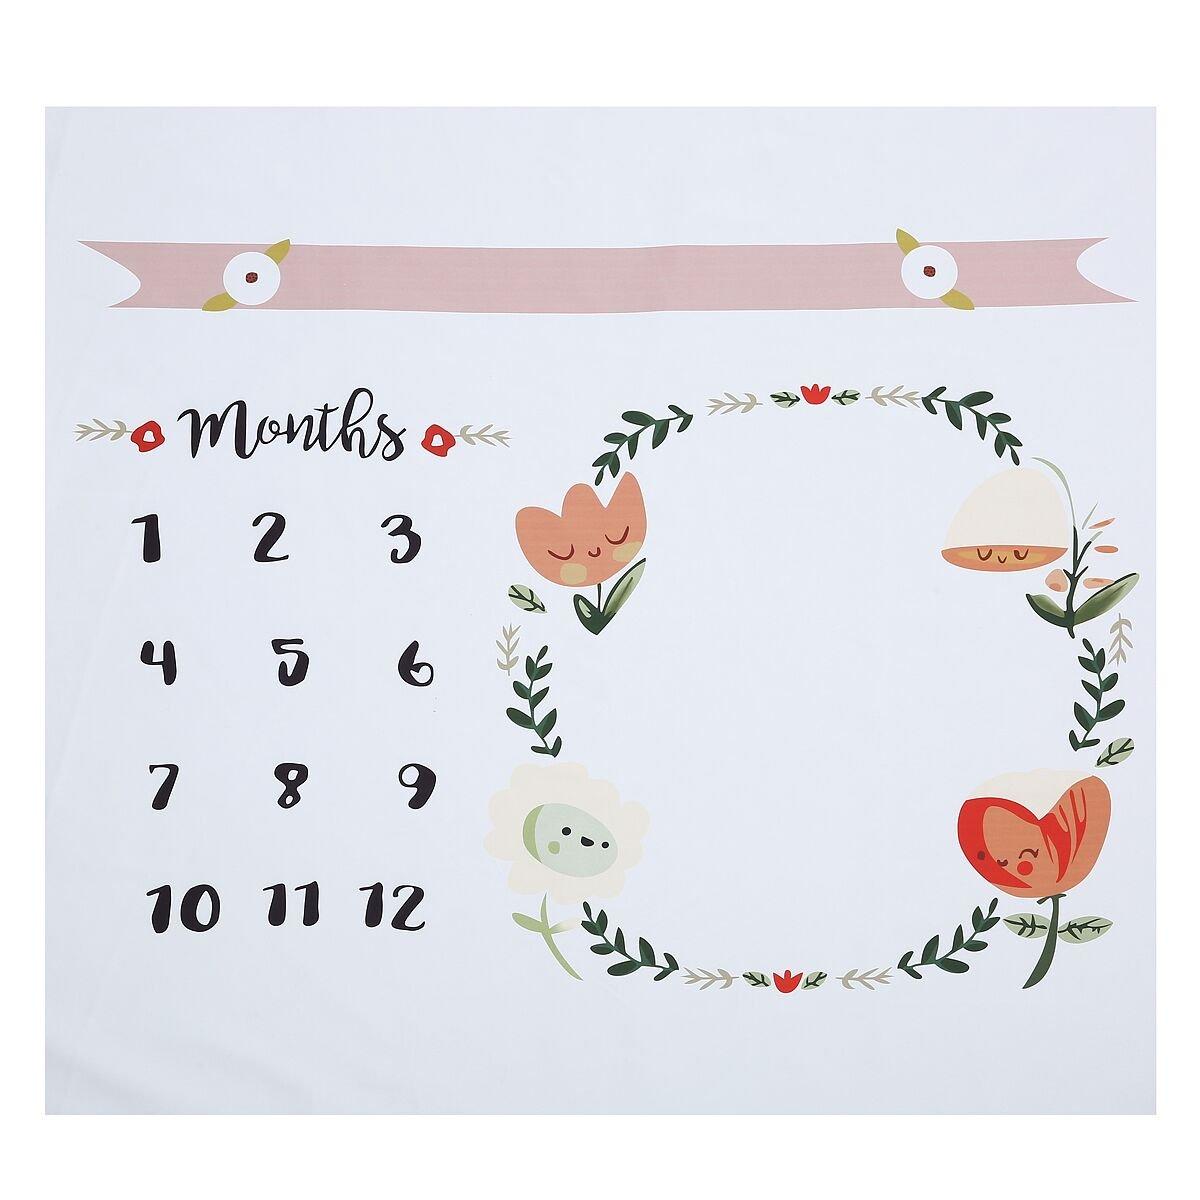 aissimio Baby Monthlyマイルストーン毛布新生児背景写真小道具撮影写真バックドロップホワイト100 x 100 cm   B077GVQKGL